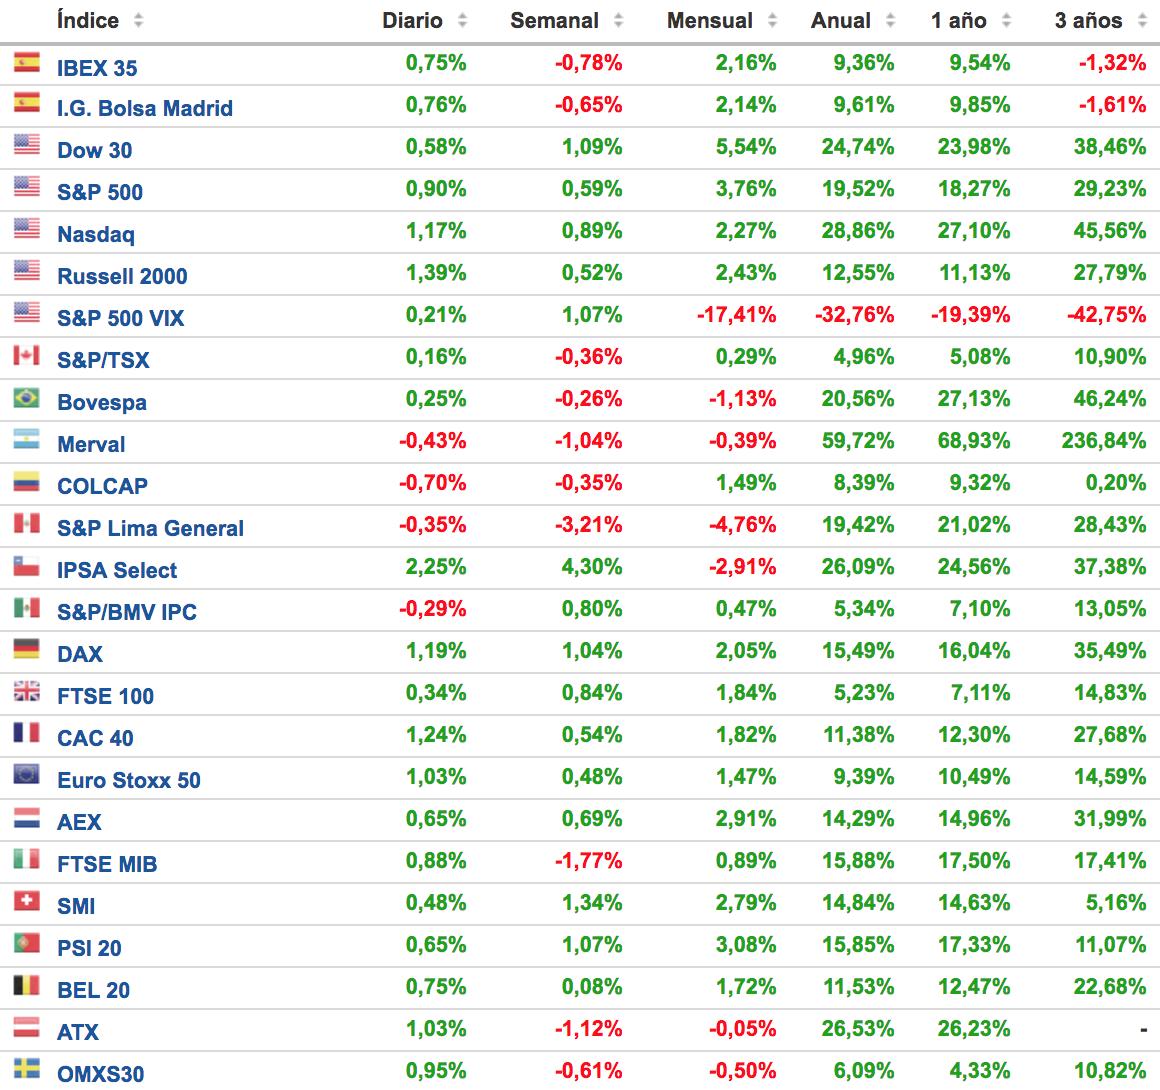 evolución de los principales índices bursátiles a 17 diciembre 2017 Altair Finance